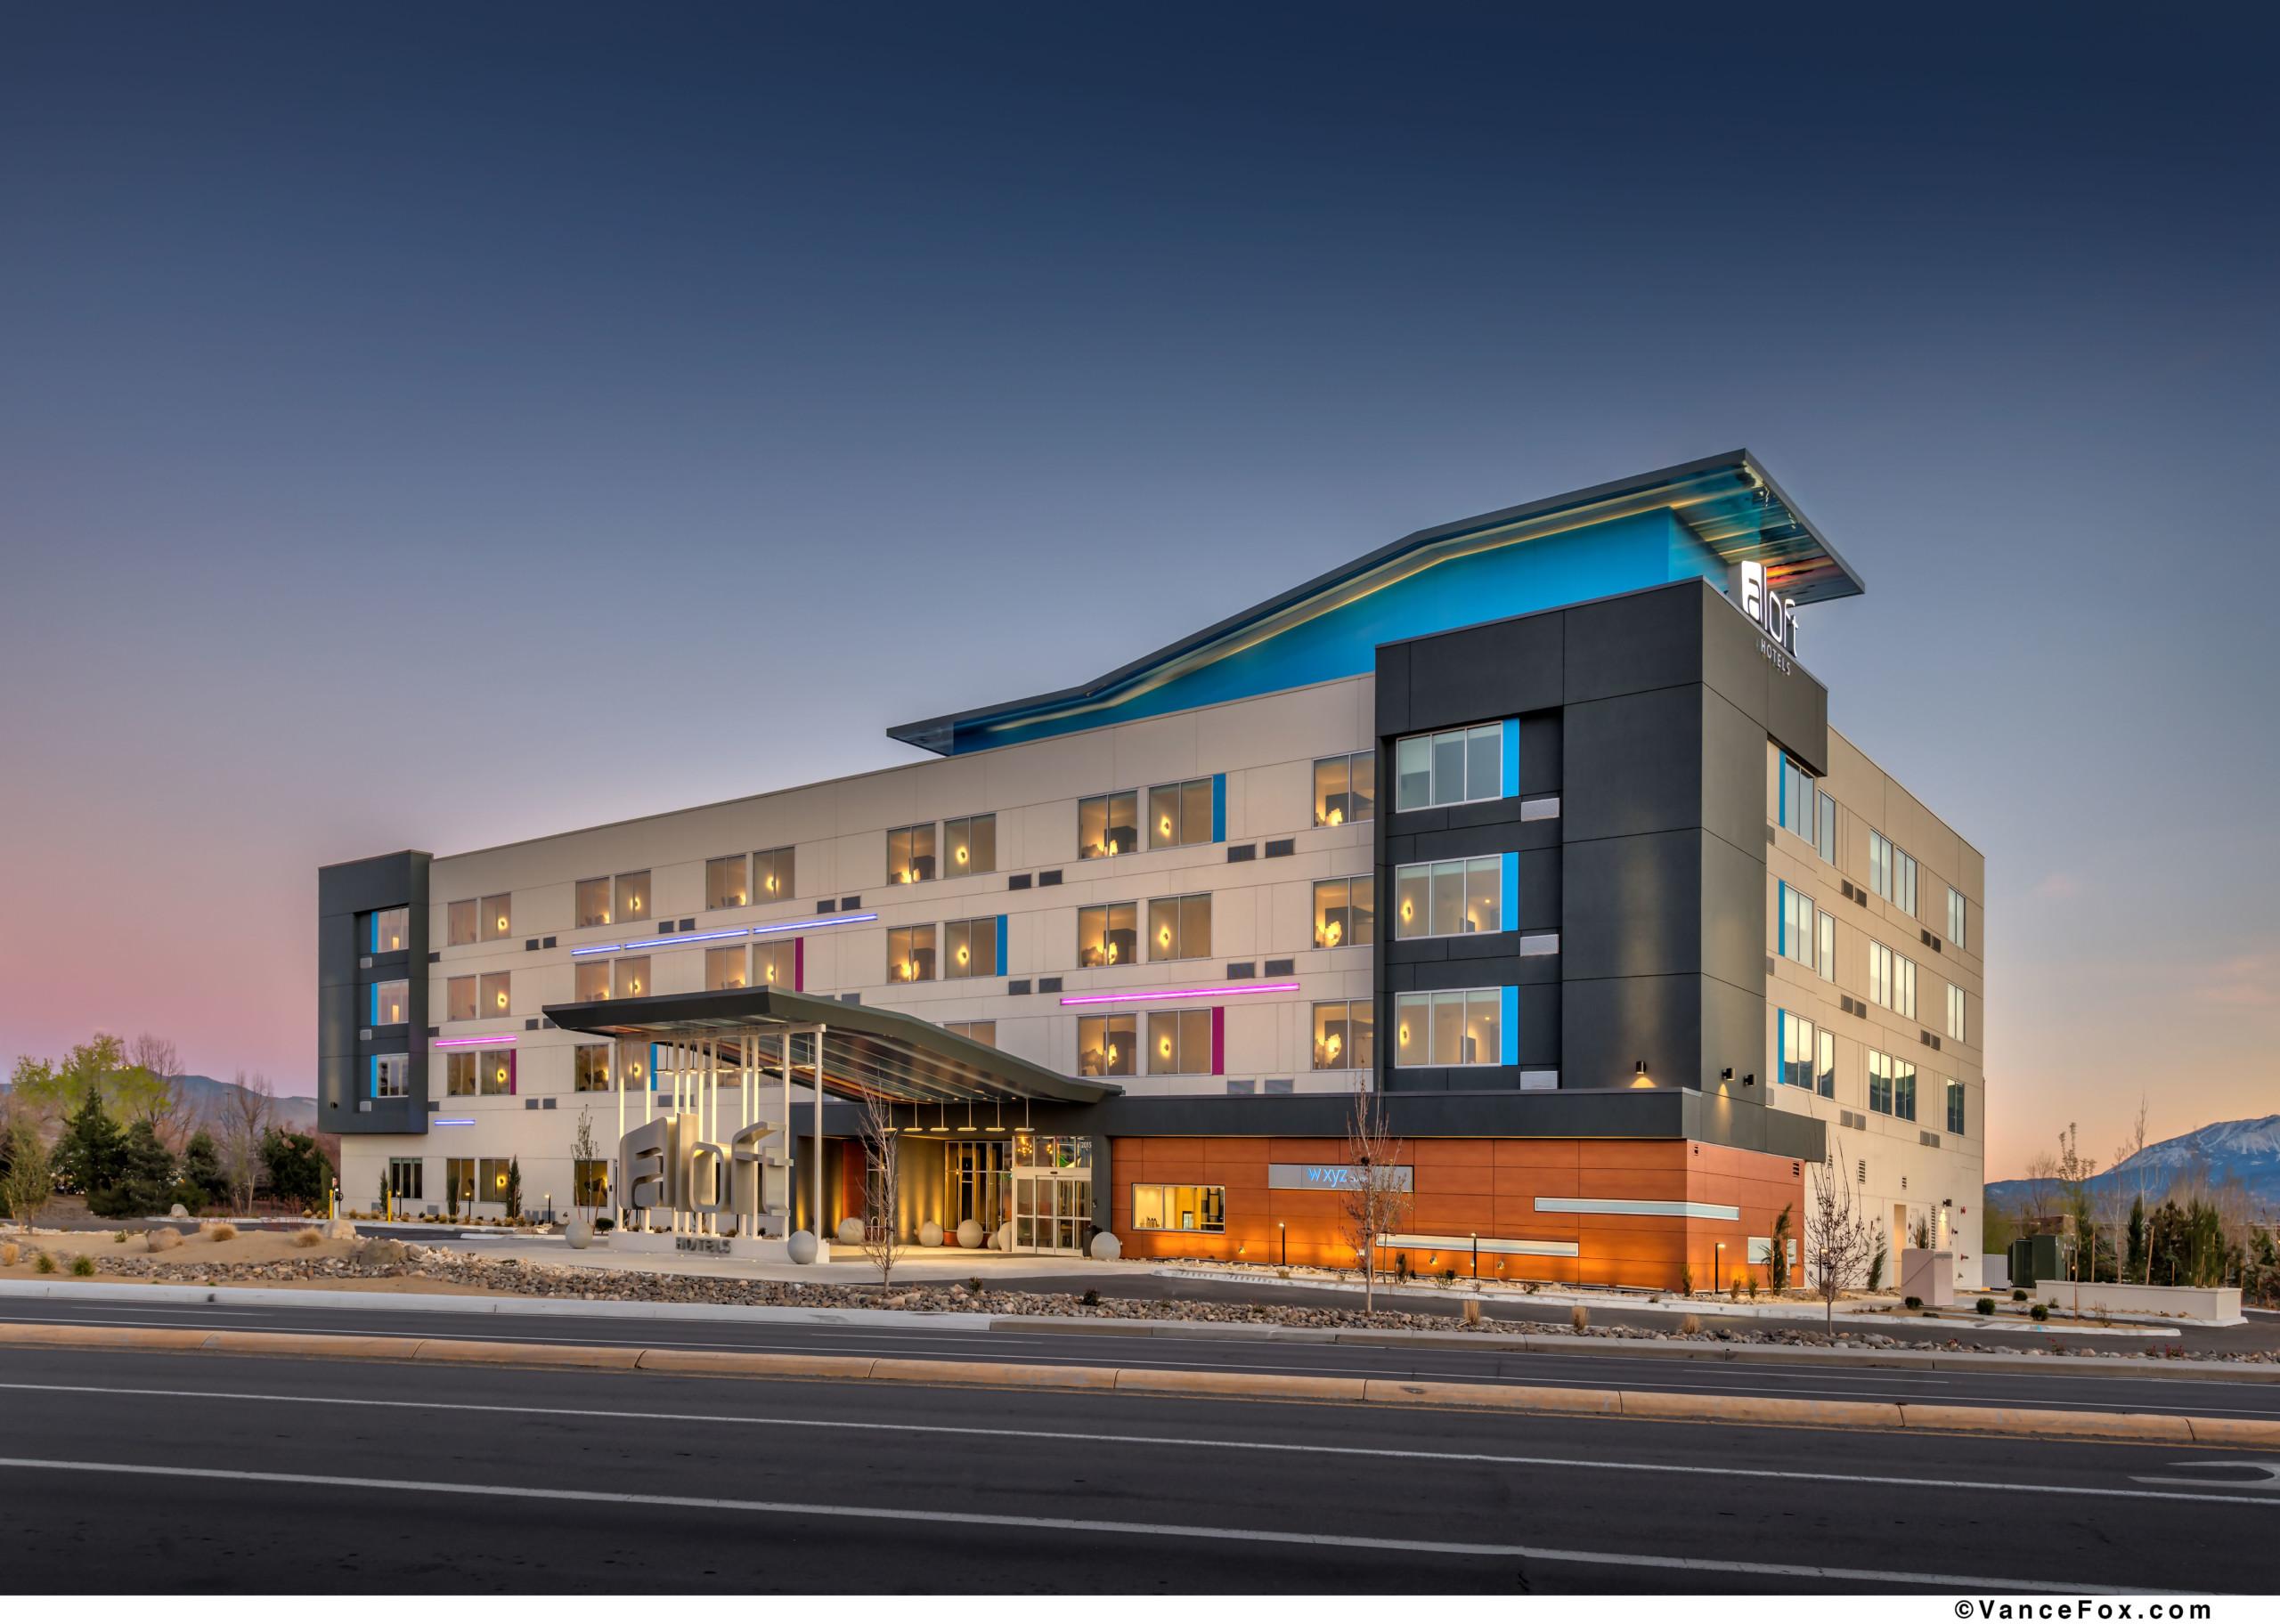 Aloft Reno Hotel